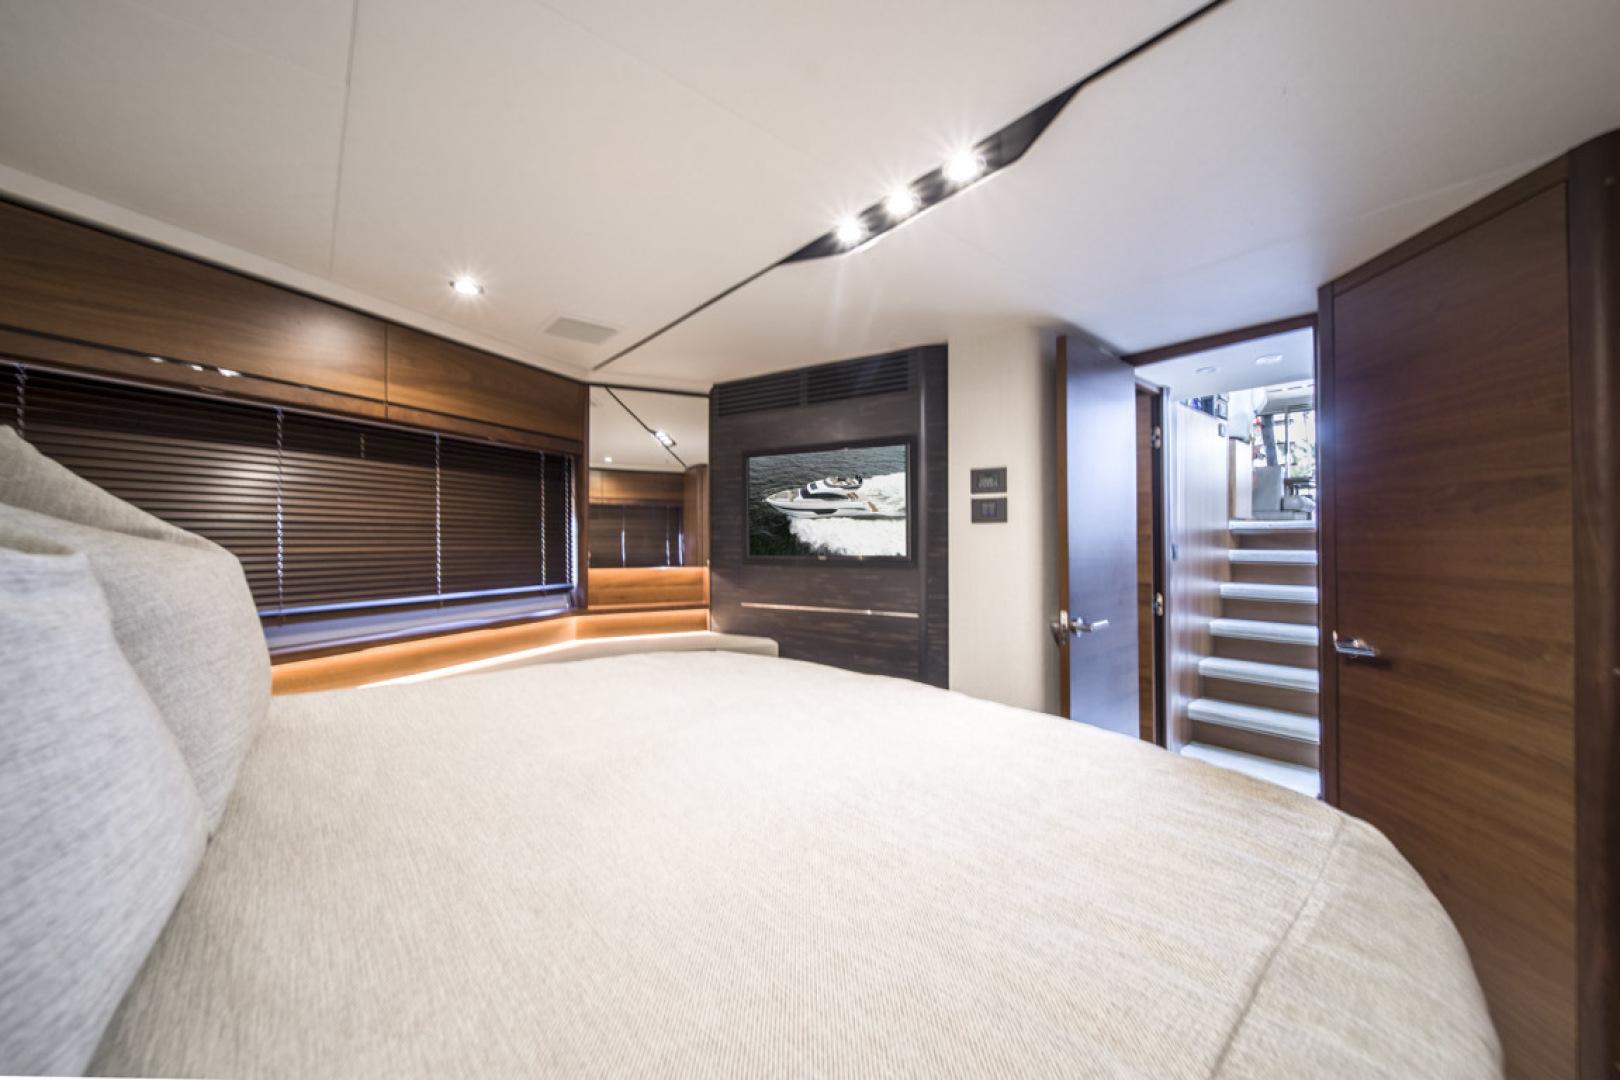 Princess-S65 2019-Paragon Cape Coral-Florida-United States-2019 65 Princess S65-Paragon-VIP Stateroom-1509921 | Thumbnail